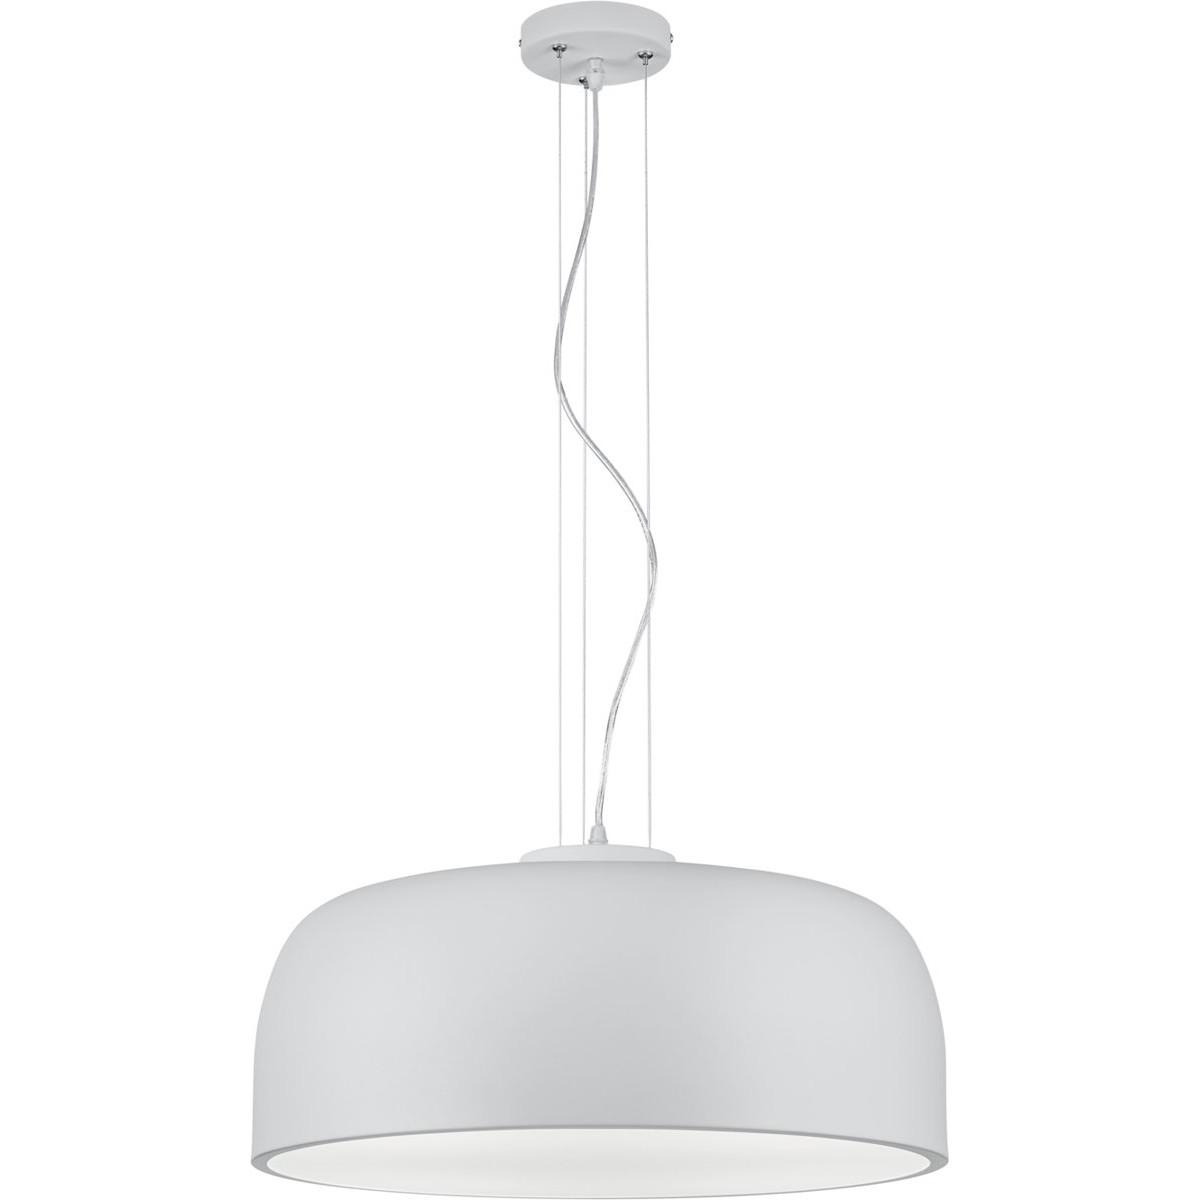 LED Hanglamp - Trion Barnon - E27 Fitting - 4-lichts - Rond - Mat Wit Aluminium